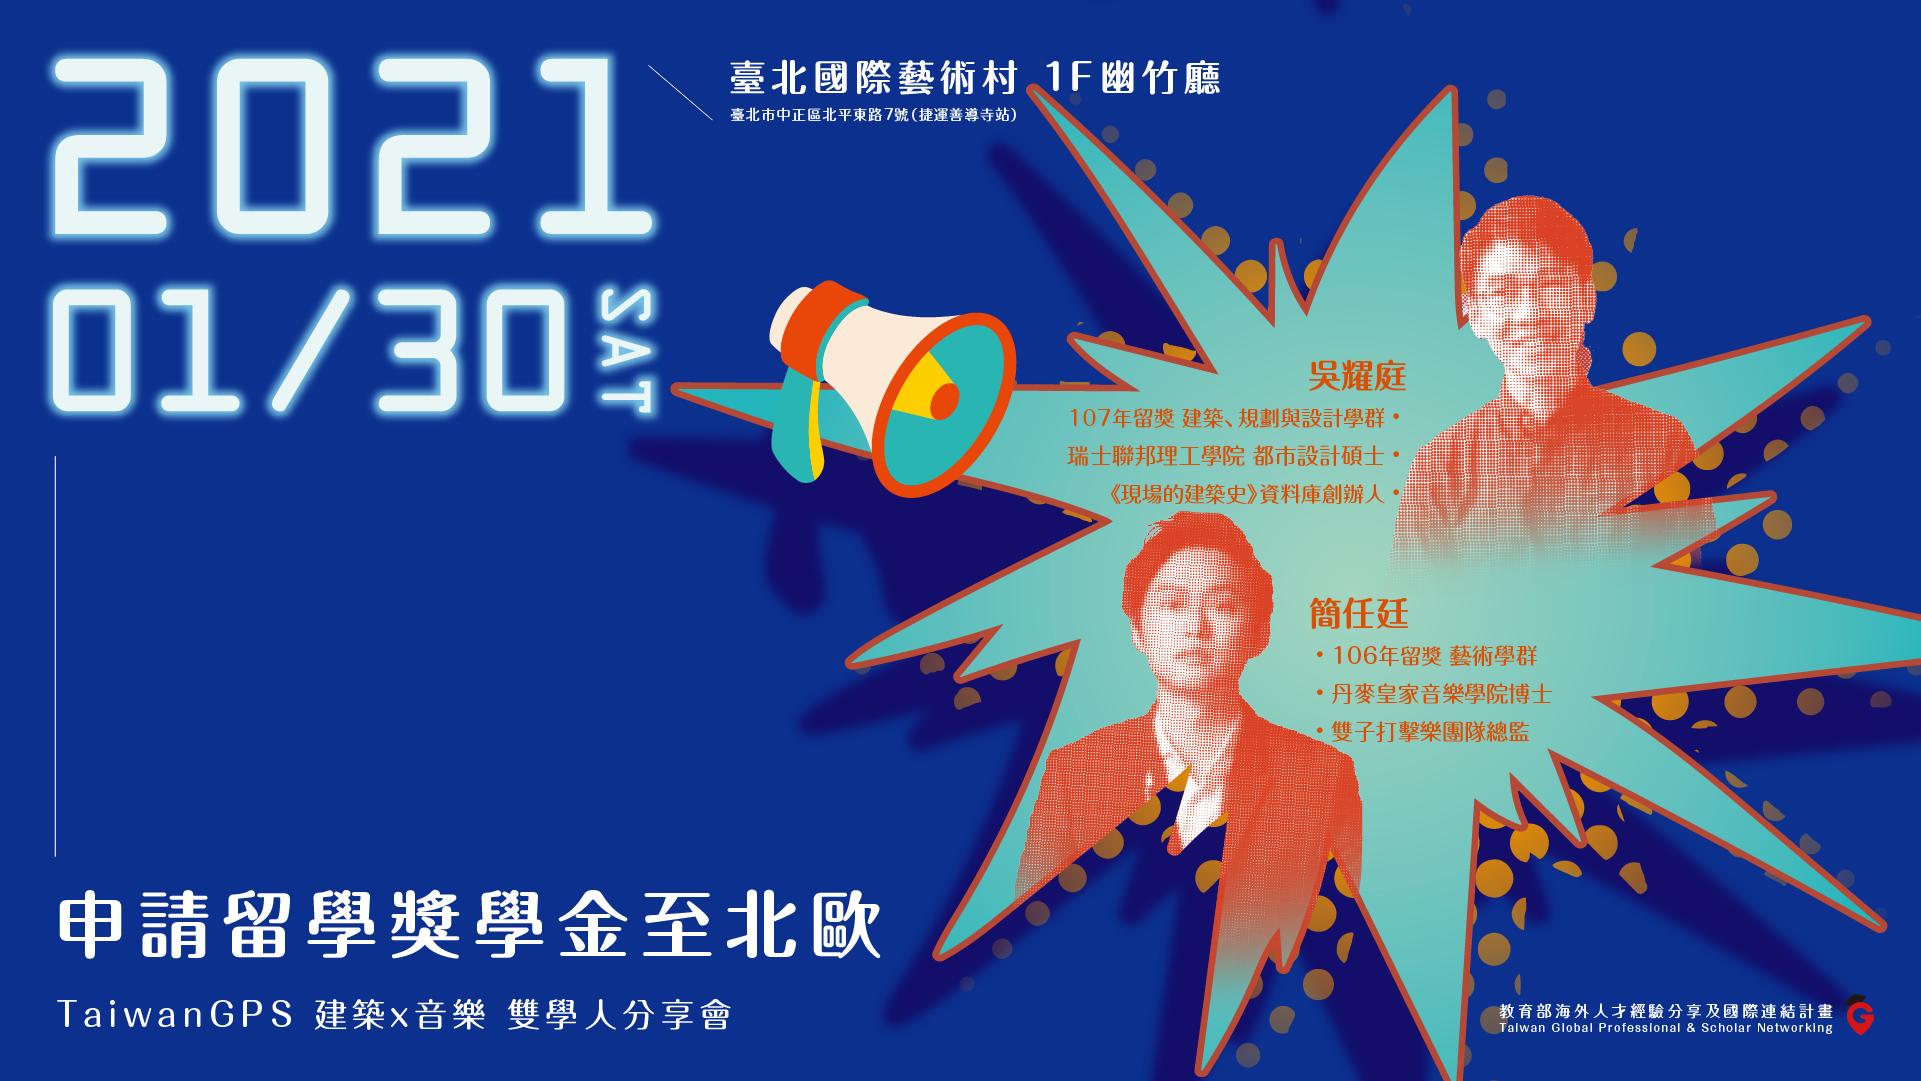 TaiwanGPS 建築X音樂 雙學人分享會|申請留學獎學金至北歐